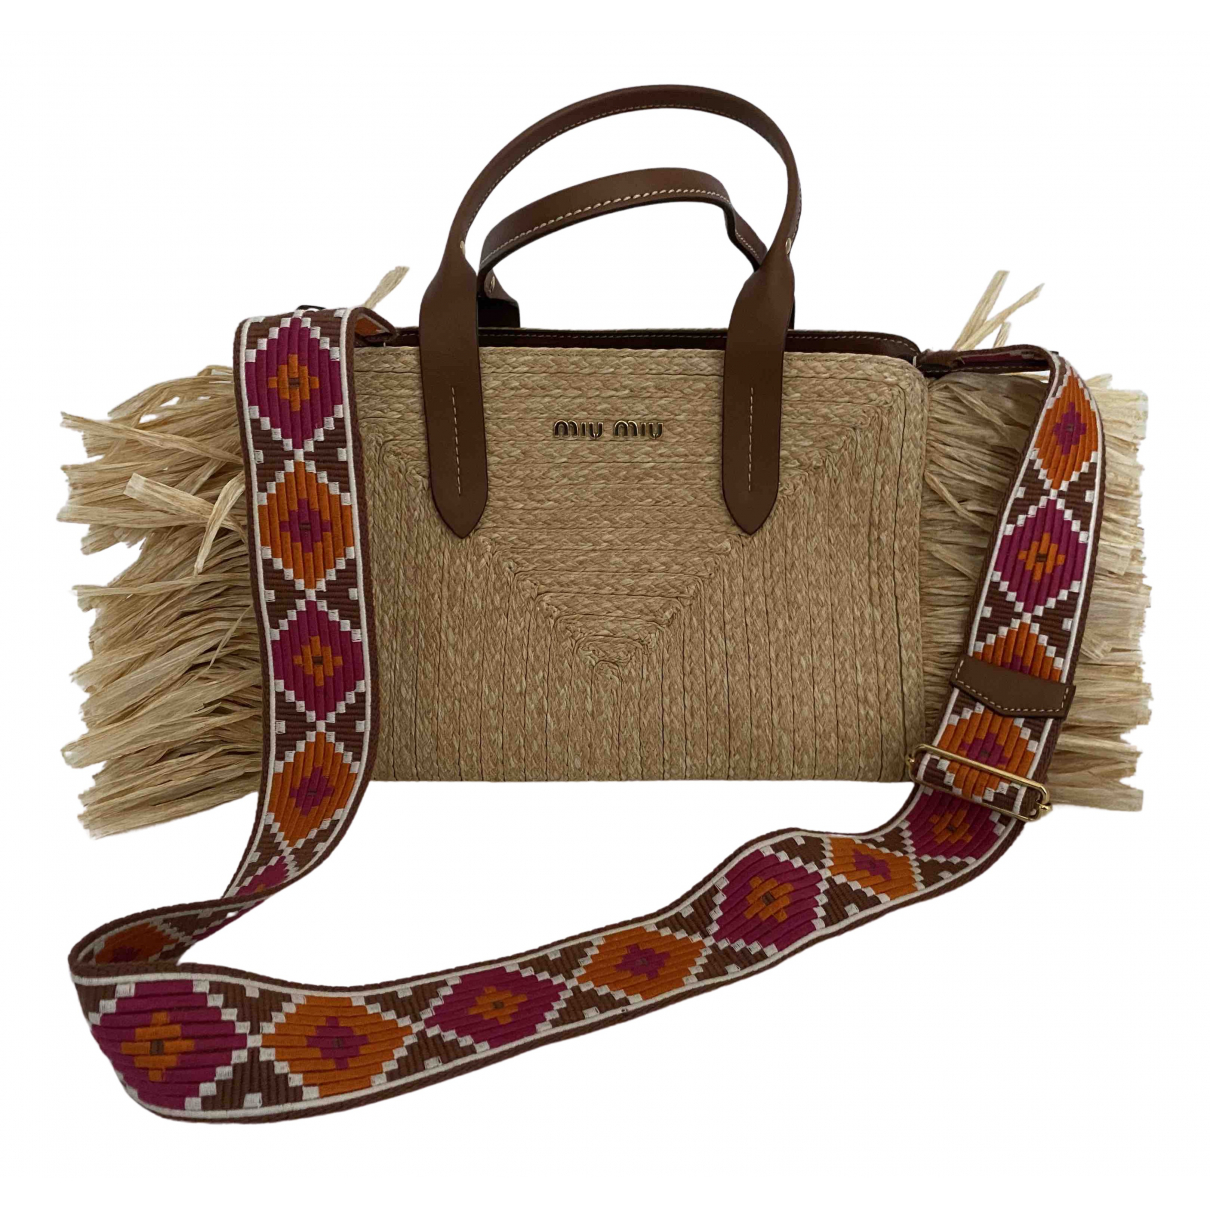 Miu Miu N Beige Wicker handbag for Women N